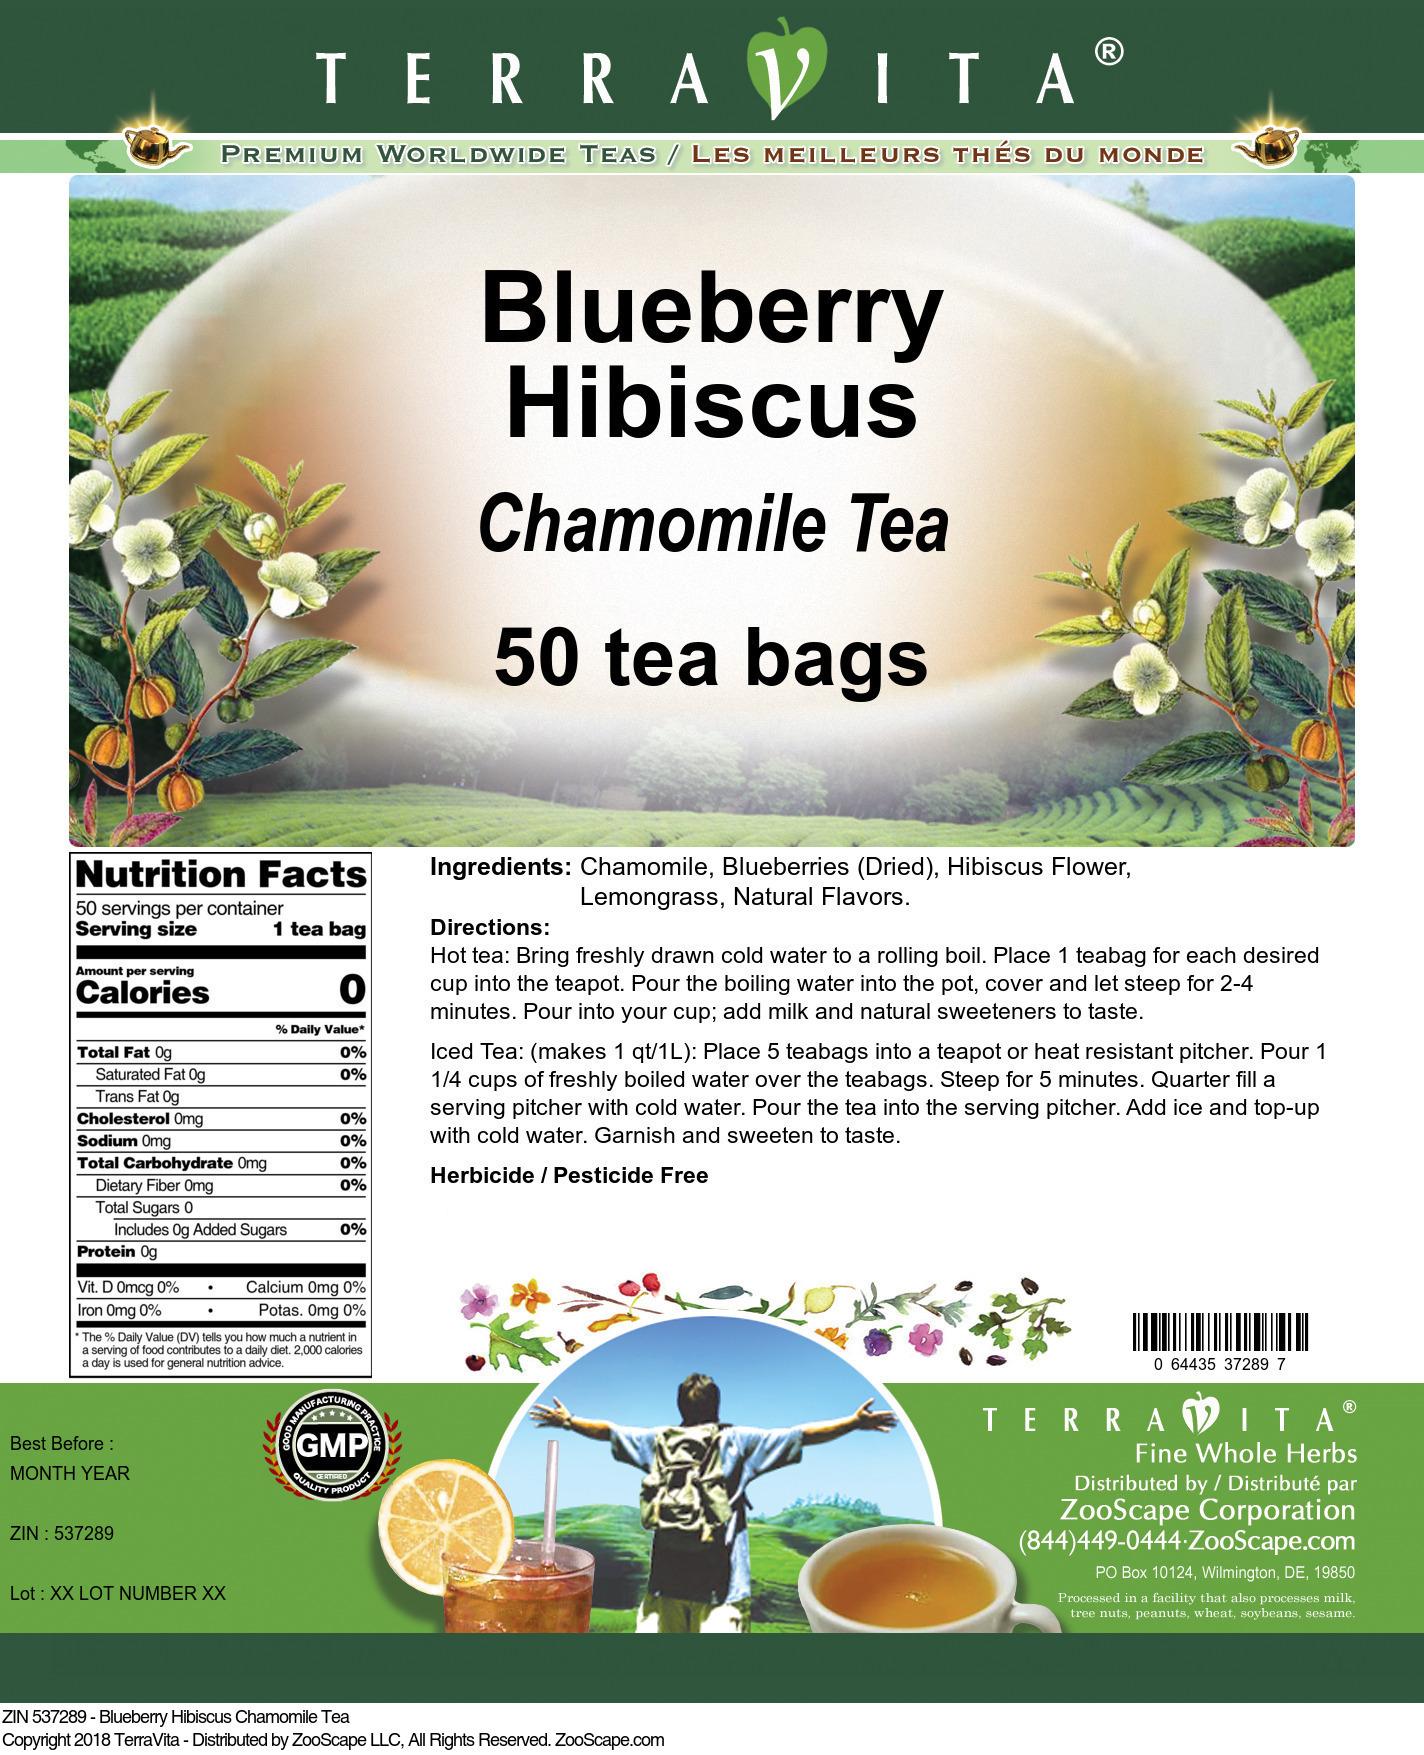 Blueberry Hibiscus Chamomile Tea